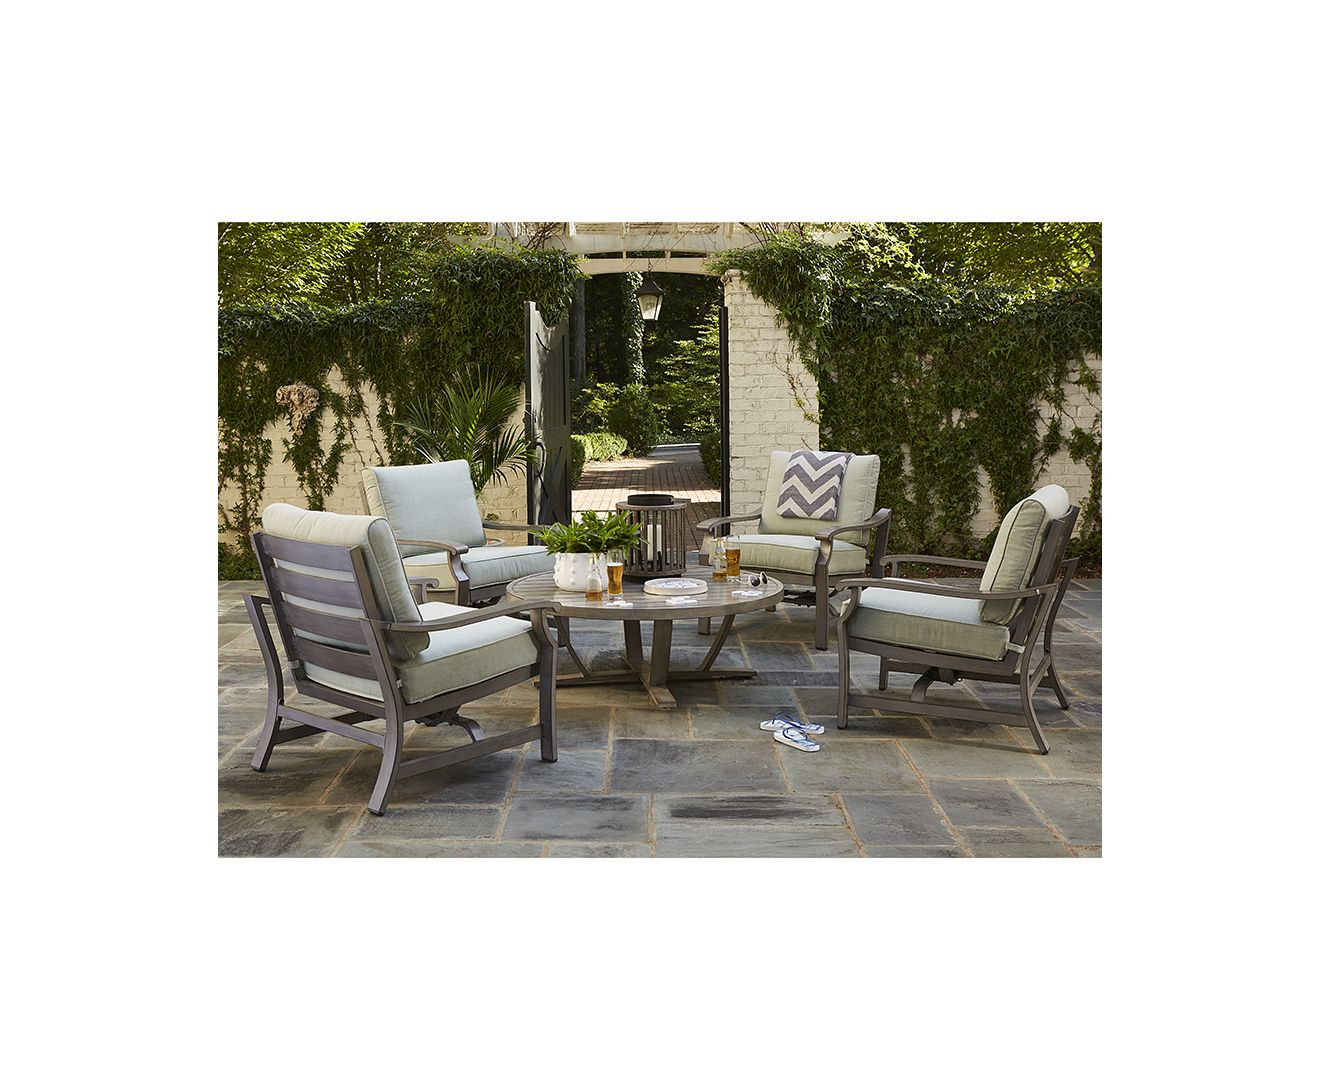 outdoor patio furniture - macy's, Wohnzimmer dekoo